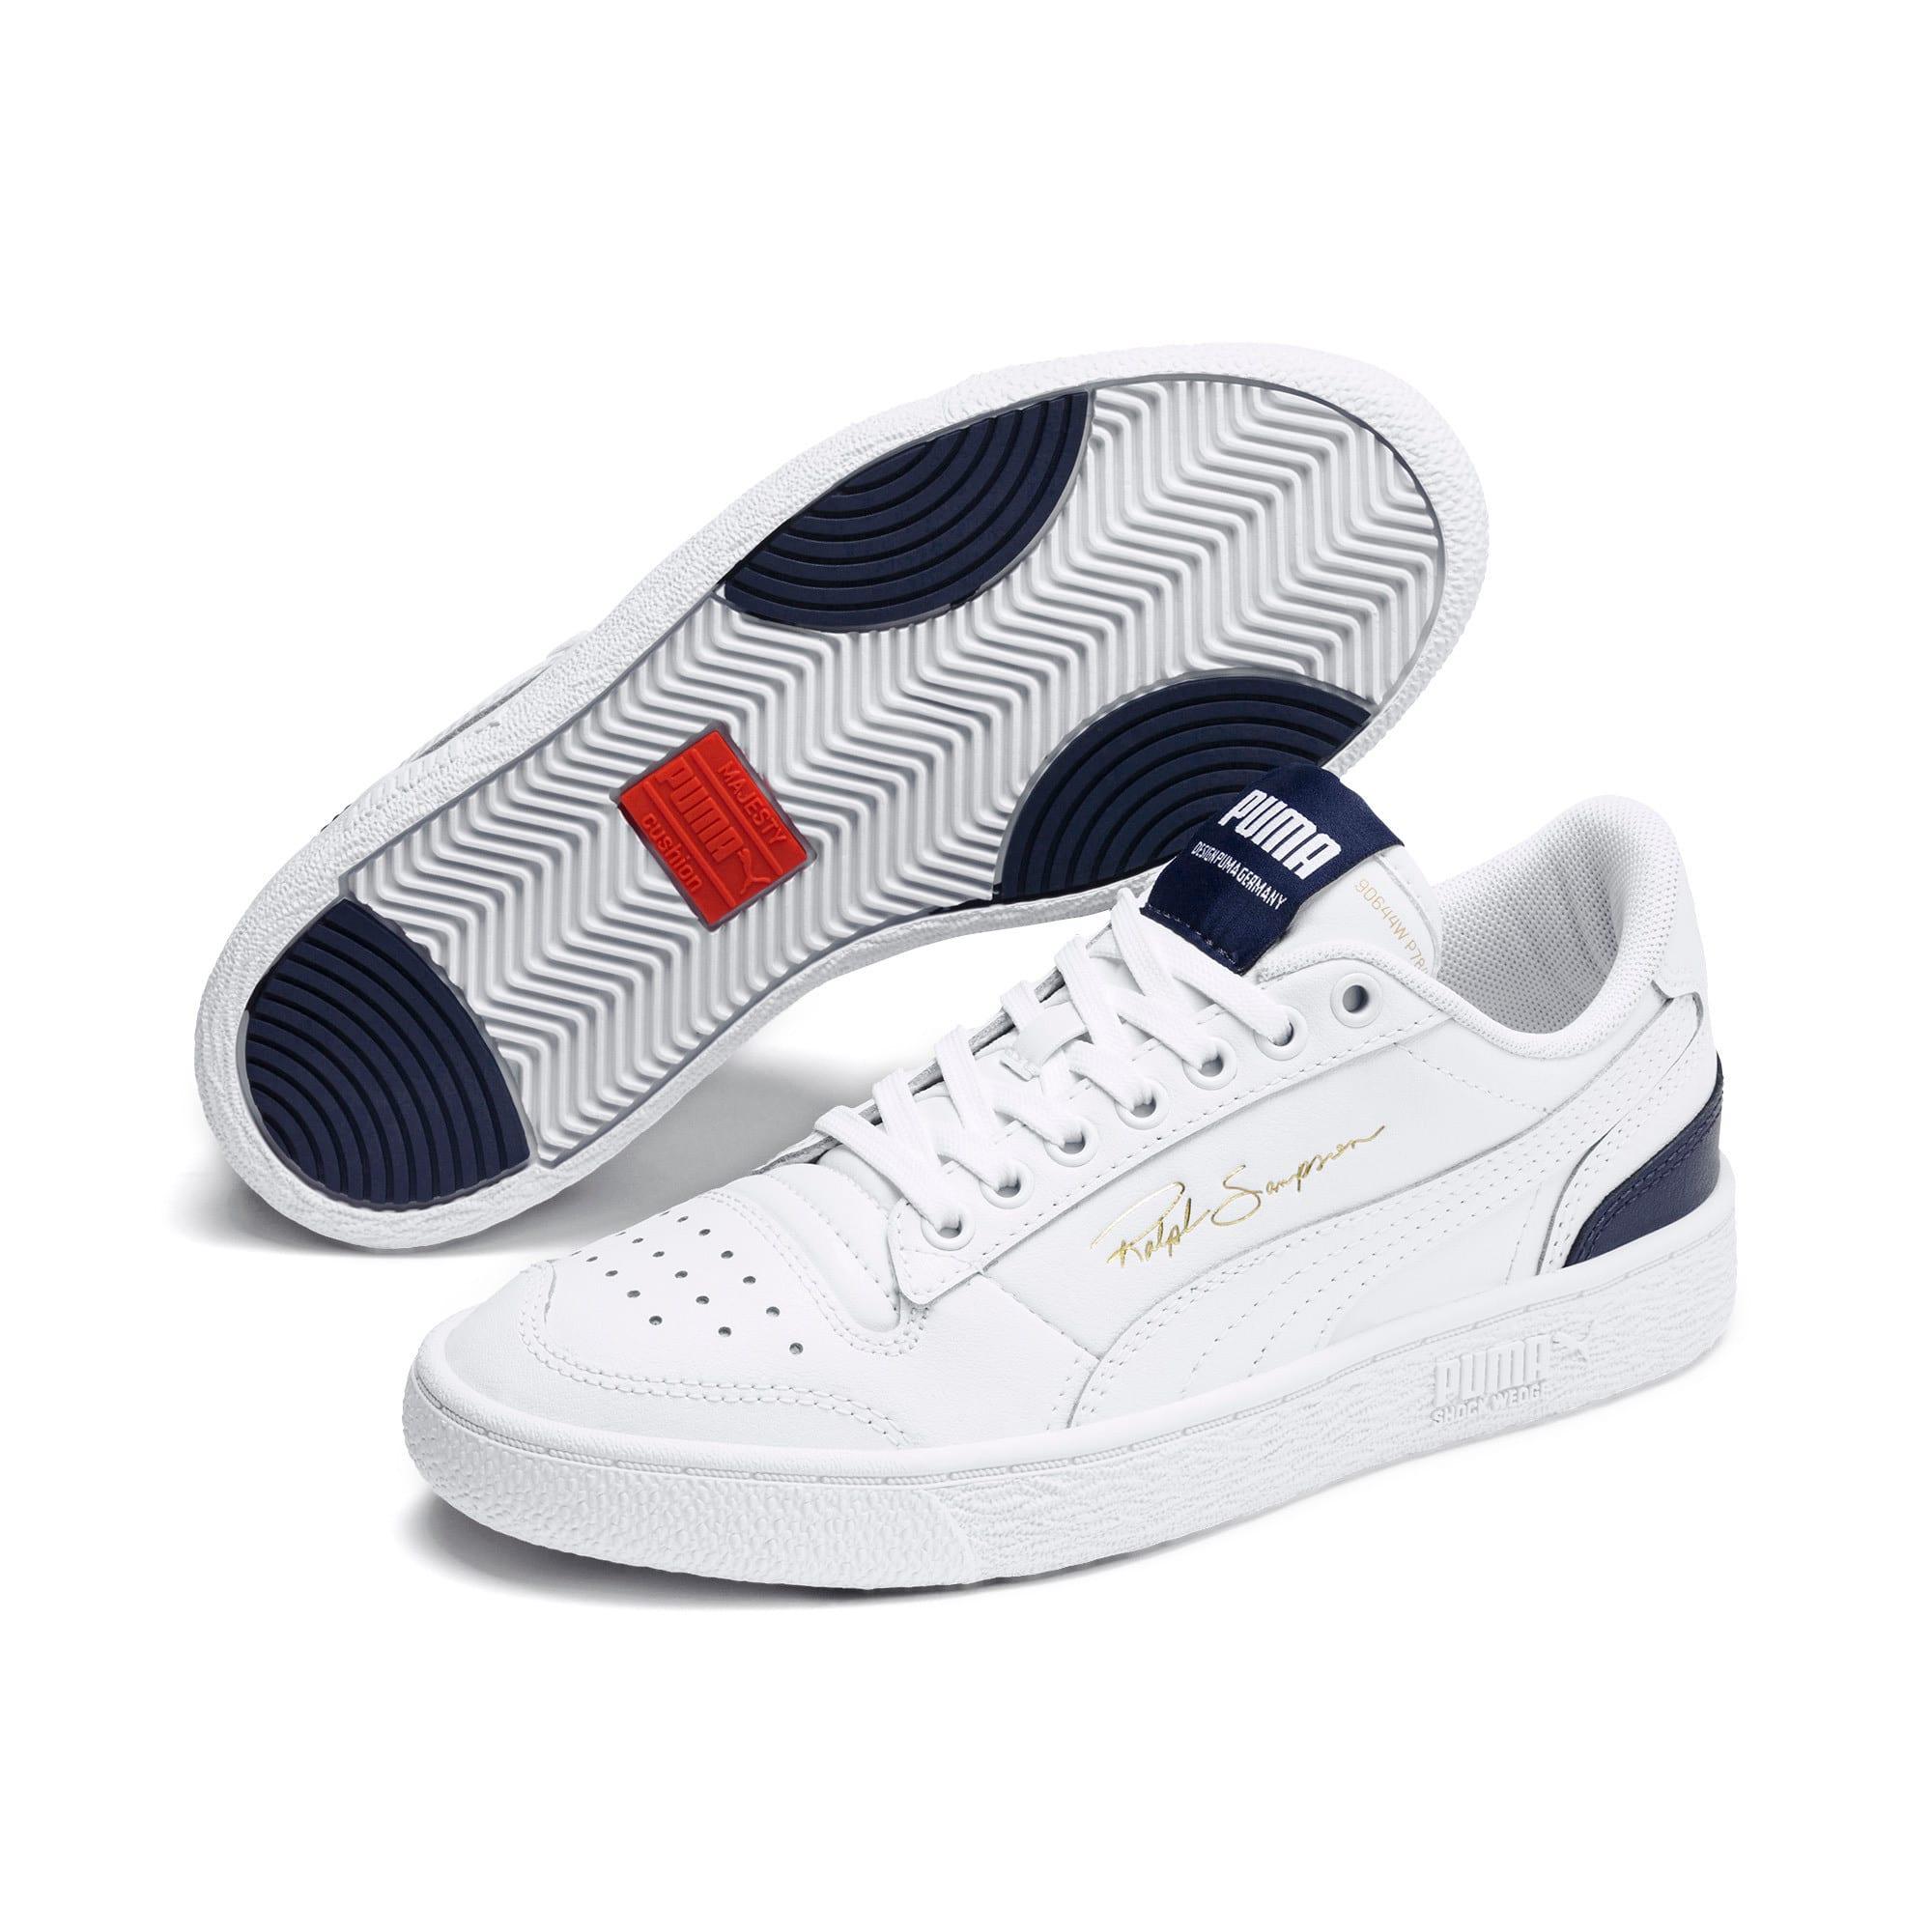 Thumbnail 2 of Ralph Sampson Lo Sneakers JR, White-Peacoat-White, medium